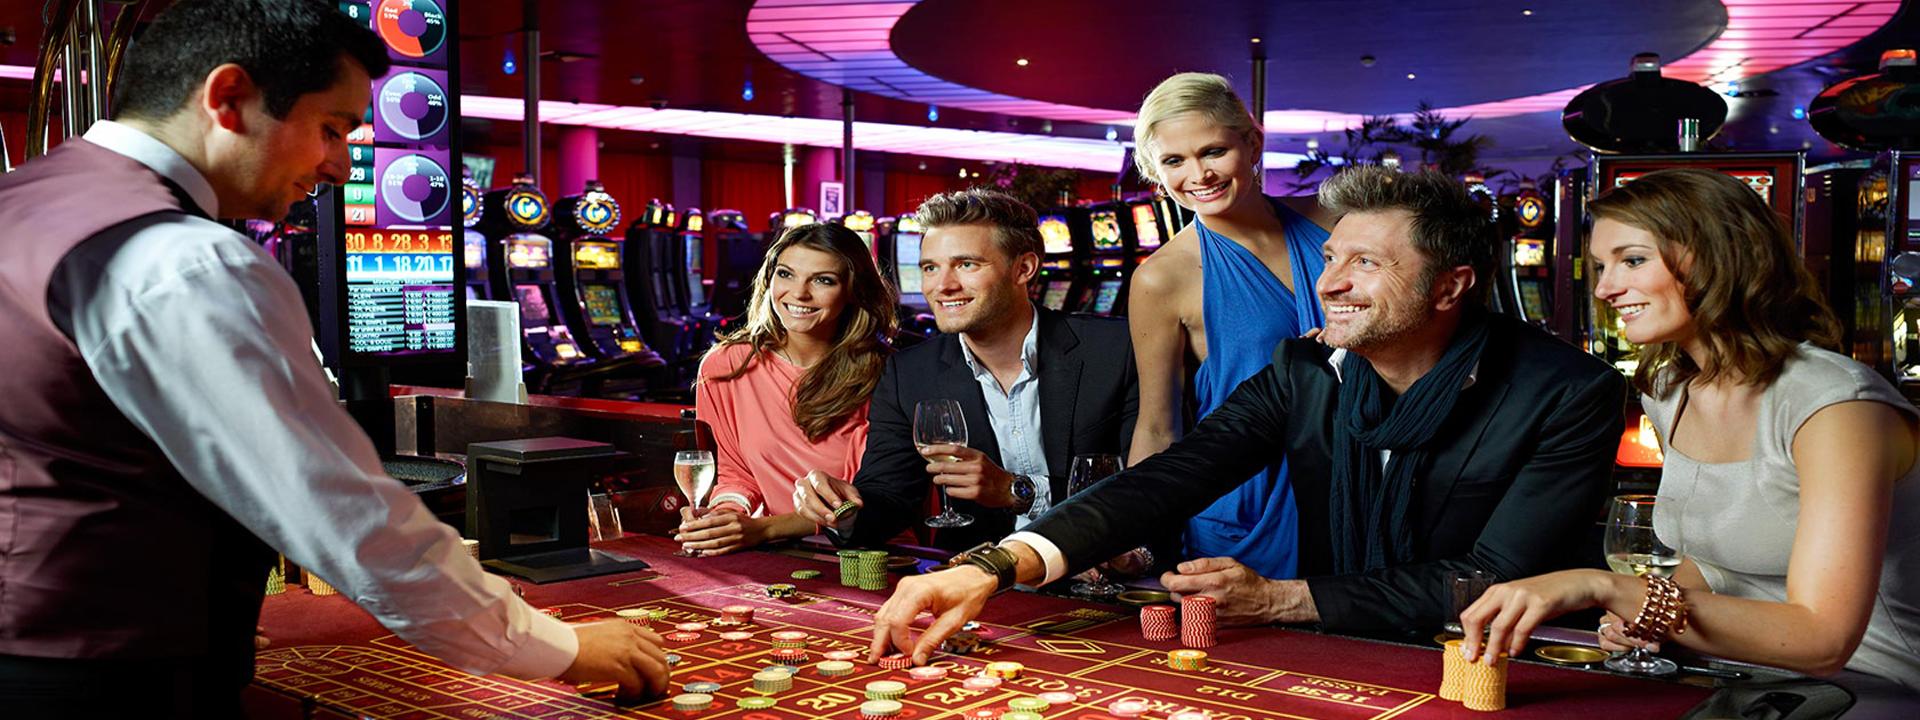 casino slide